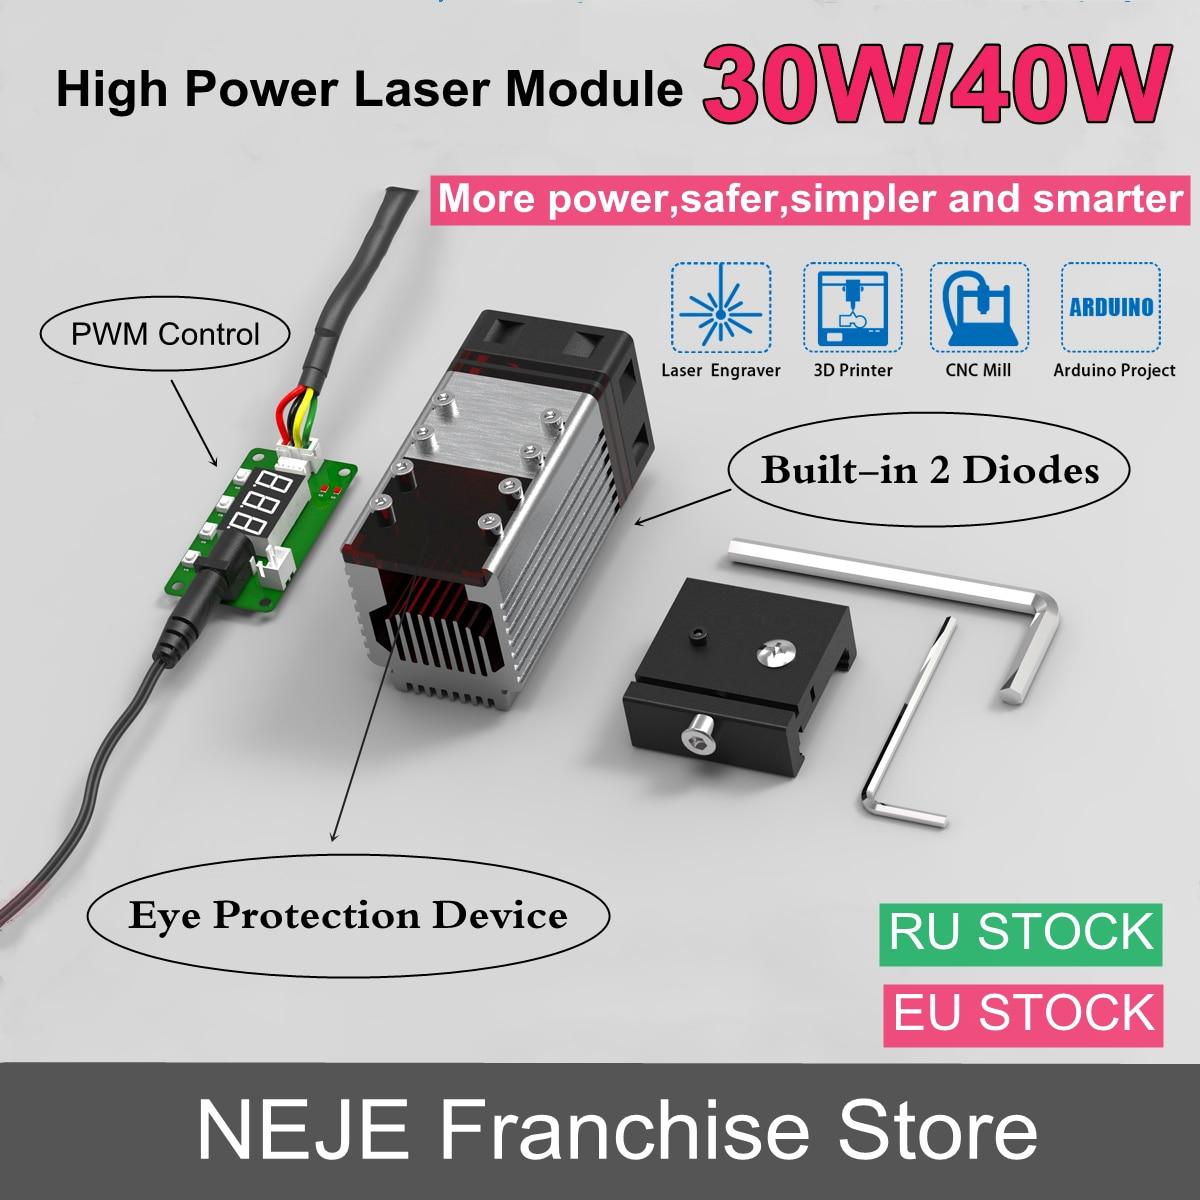 NEJE 40W/80W Laser Module Kit Laser Head Built-in 2 Diodes 450nm TTL Module for Laser Engraver Machine Wood Cutter Cutting Tool